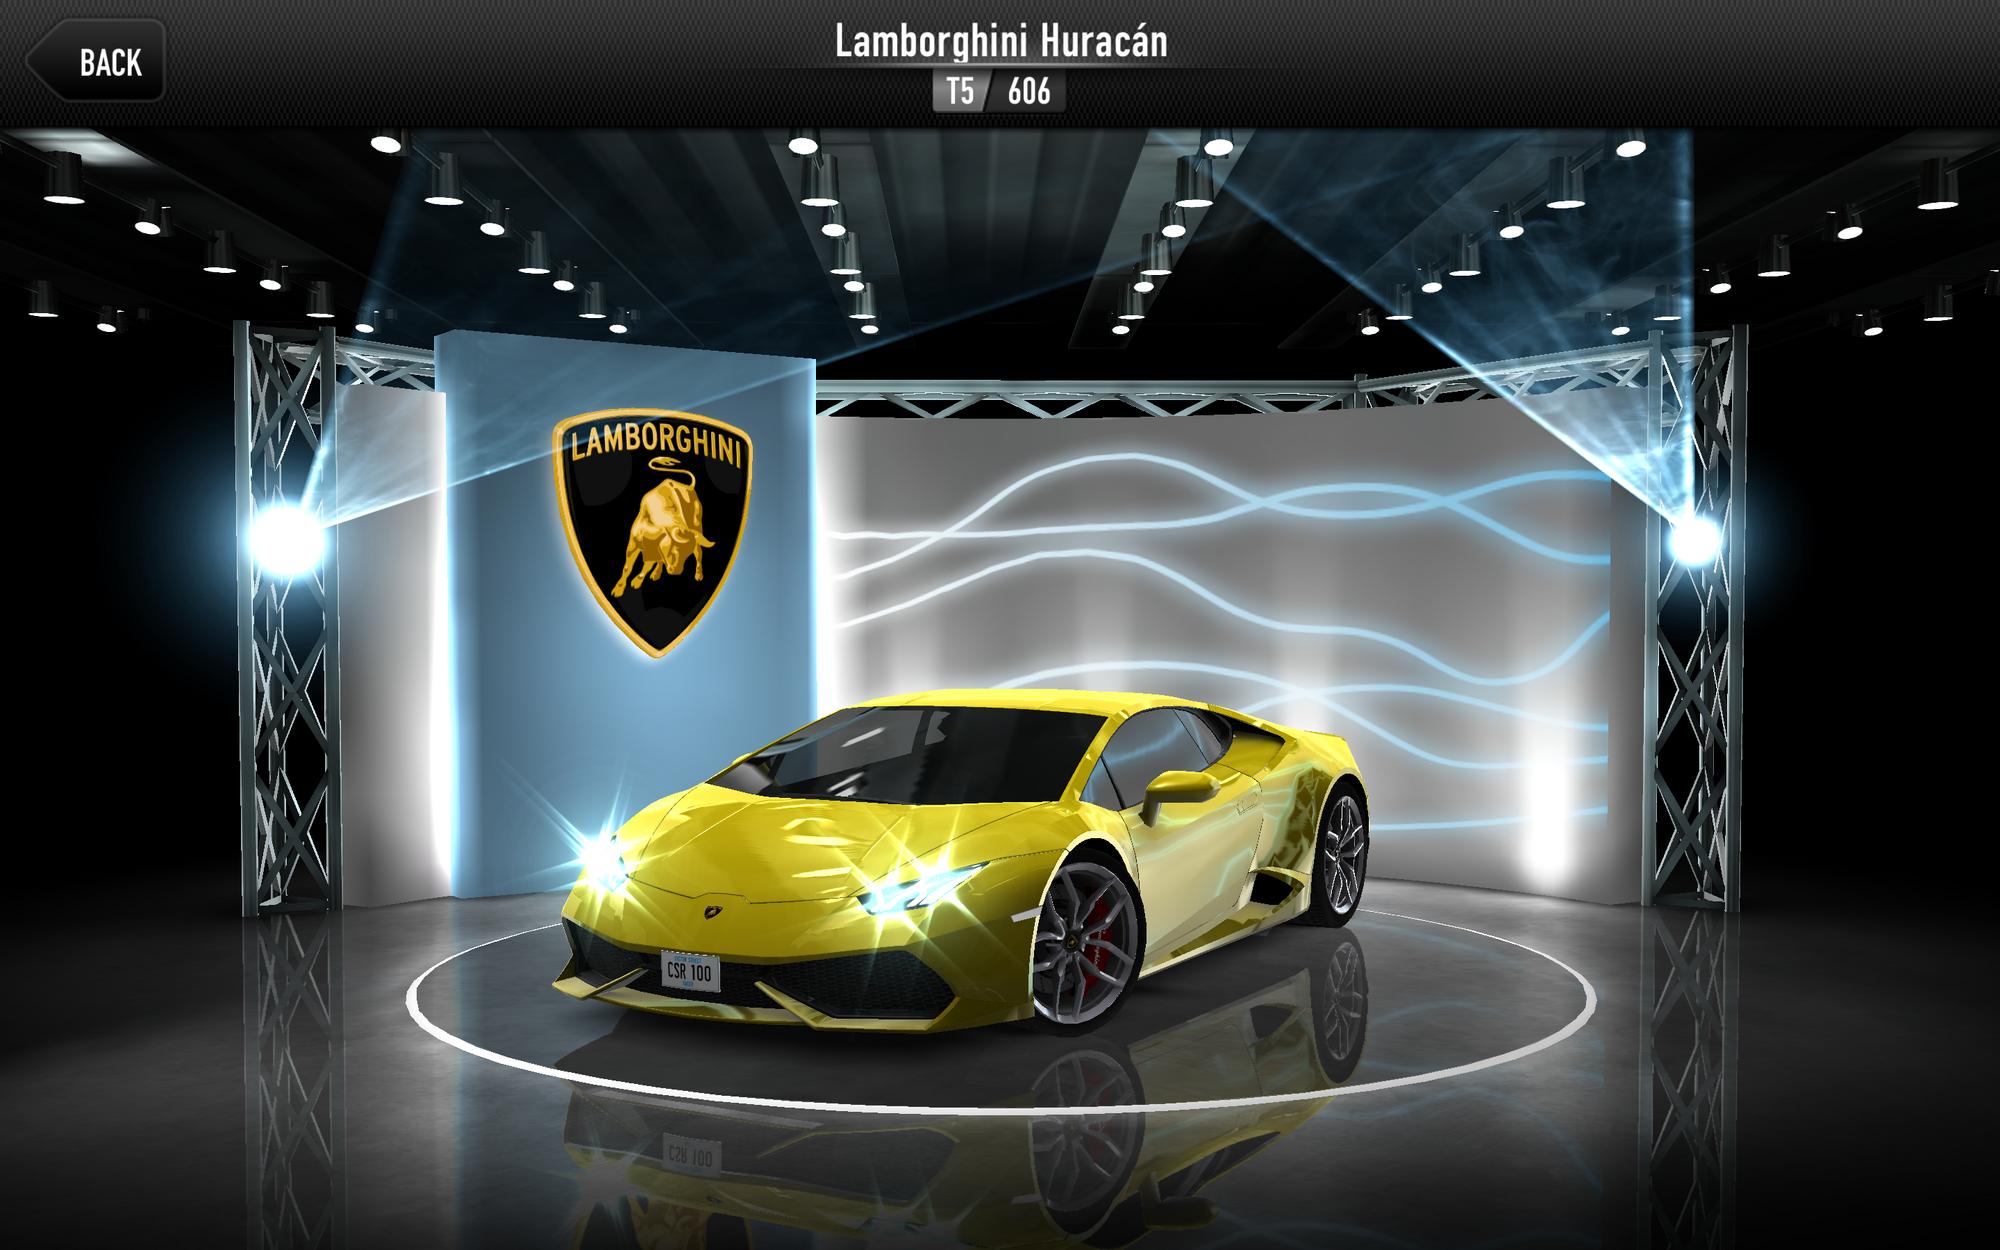 Lamborghini Huracan Csr Racing Wiki Fandom Powered By Wikia